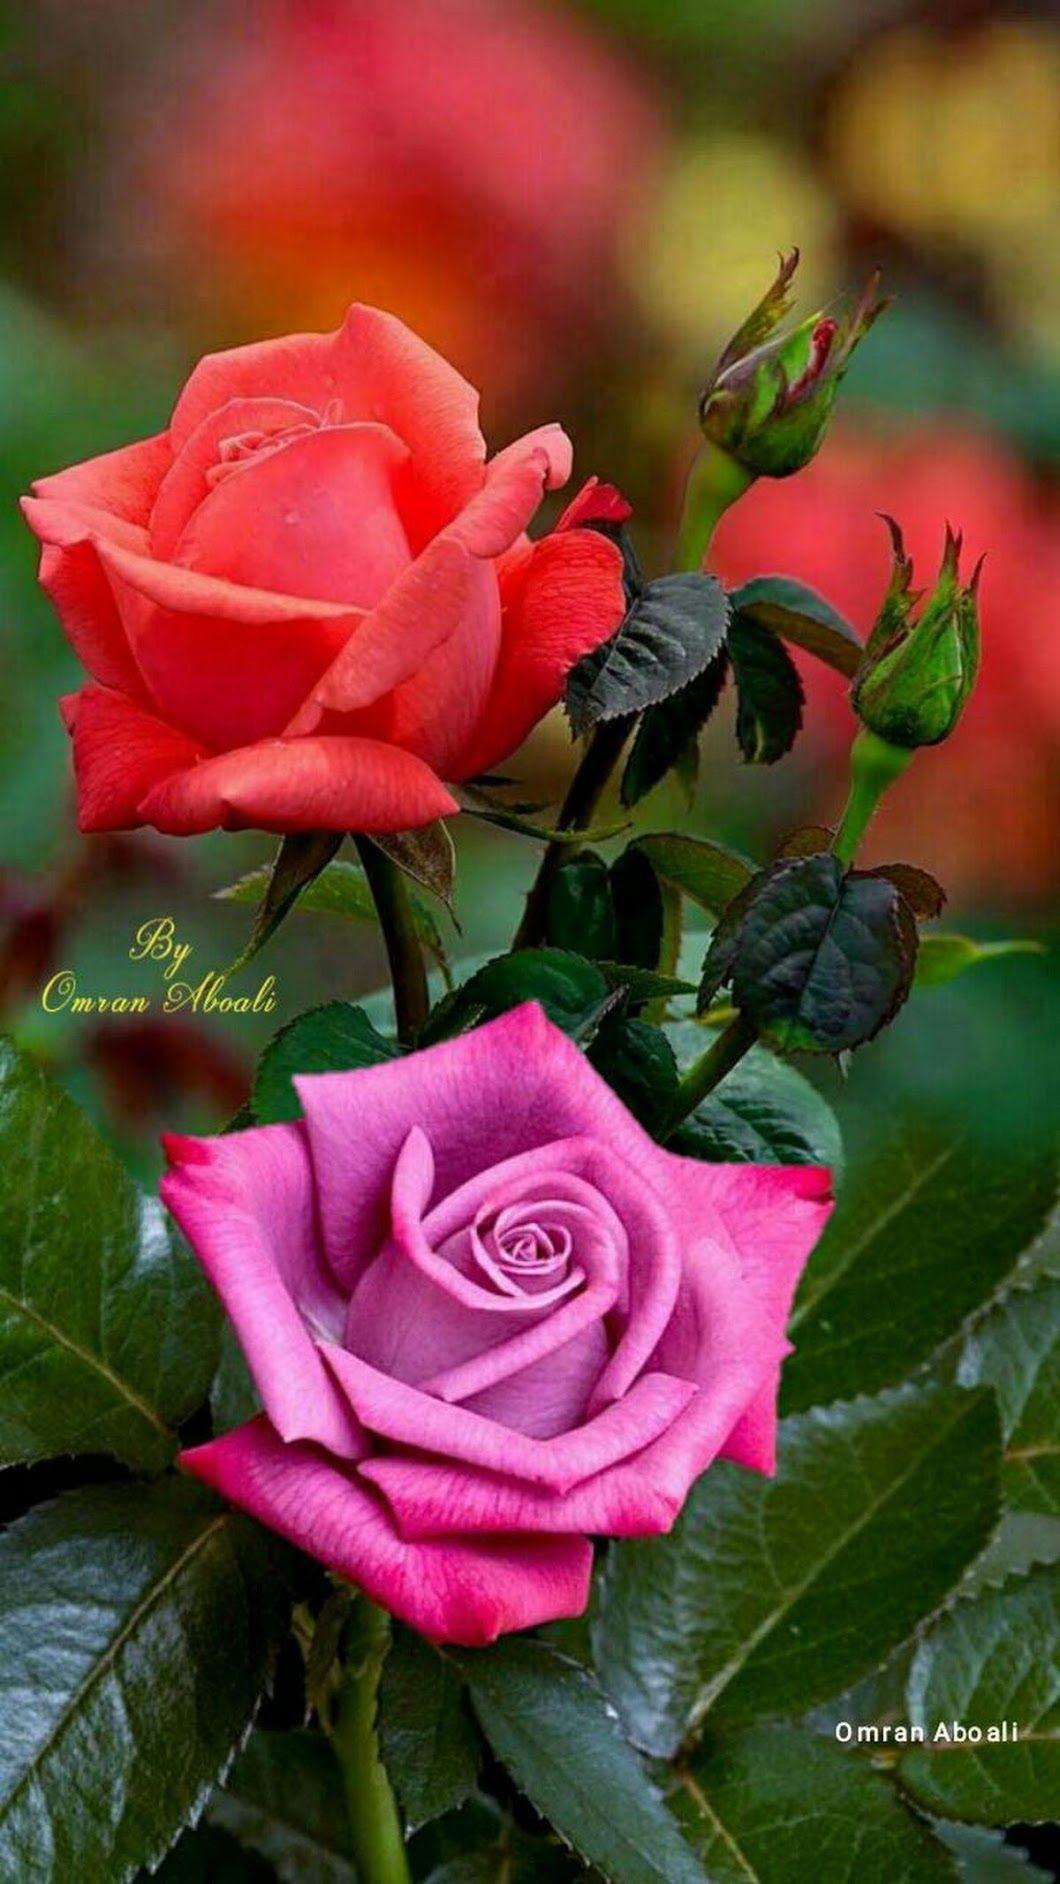 flowers pinterest hybrid tea roses flowers and flower pictures flowers pics pink flowers pink roses hybrid tea roses izmirmasajfo